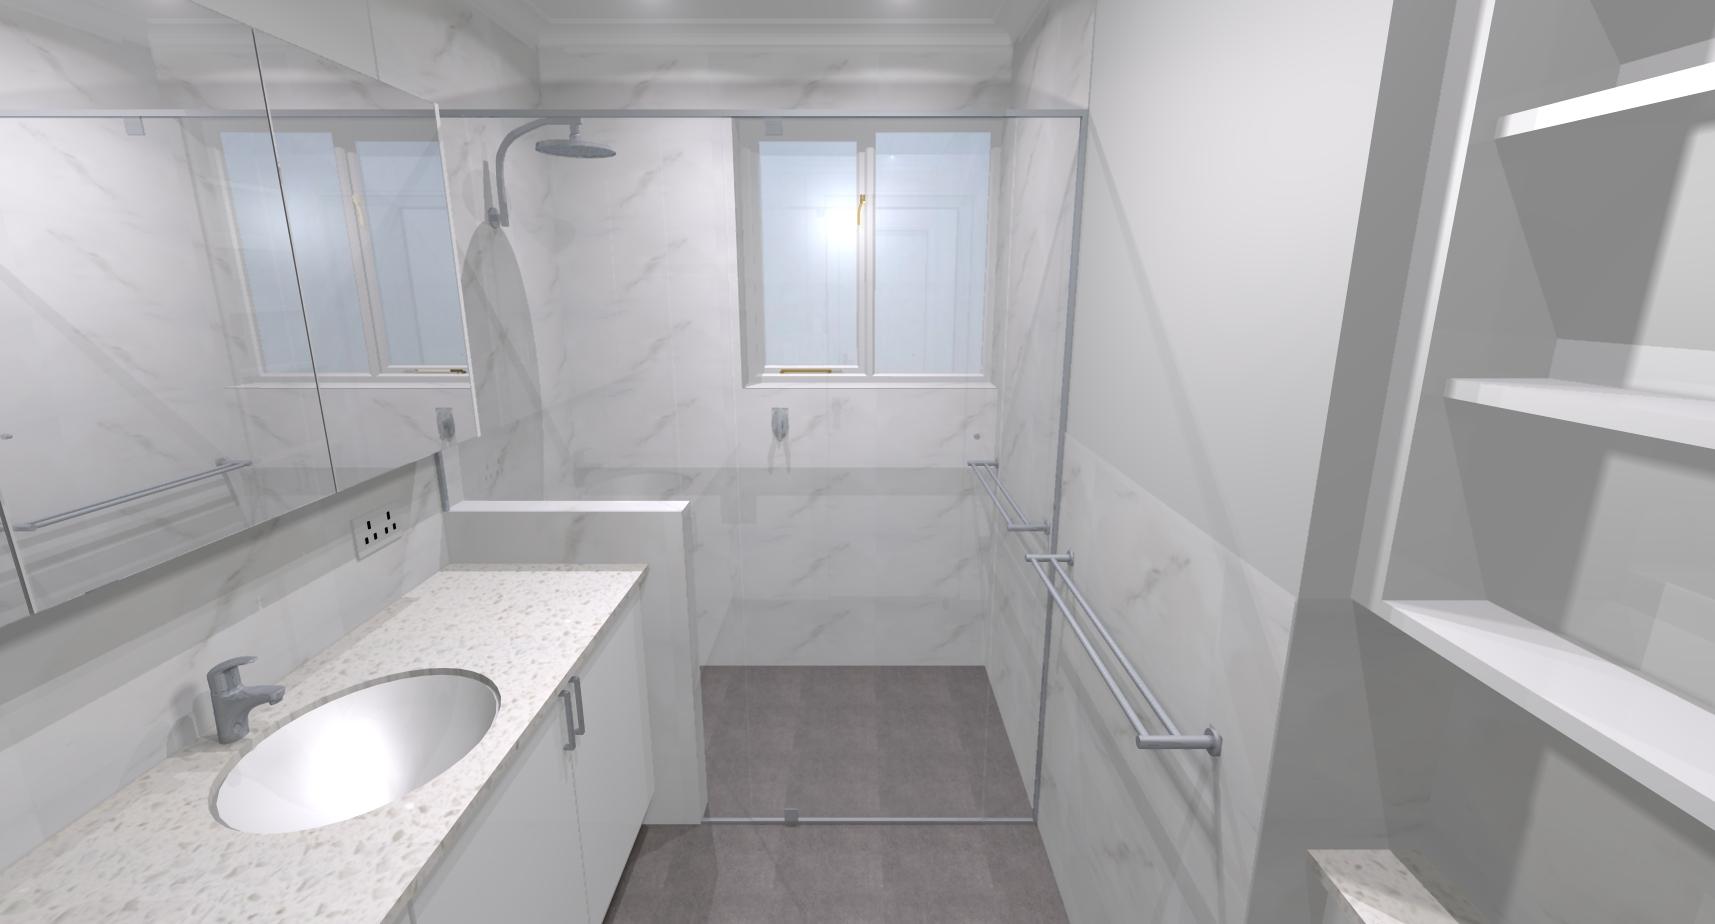 Kaye edward j bathroom bathroom renovations perth for Bathroom renovations 3d